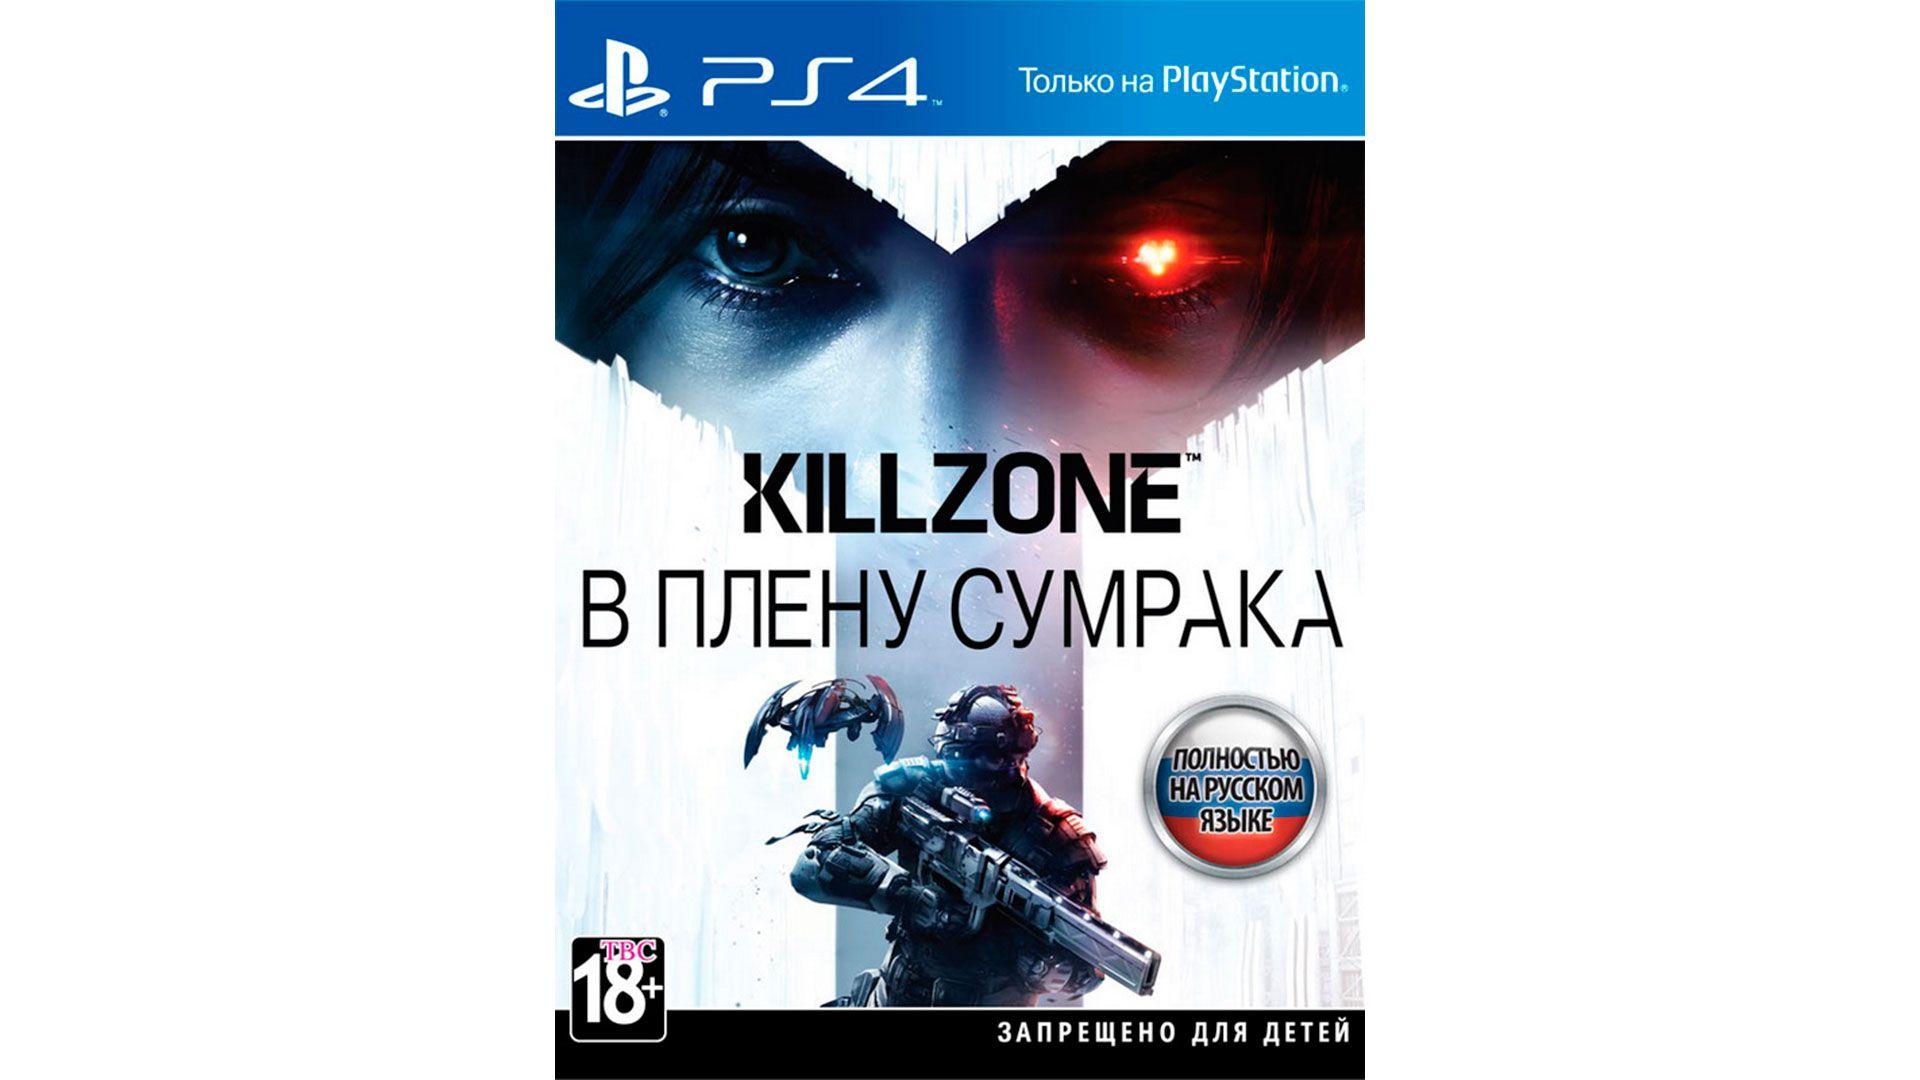 Killzone: В плену сумрака игра для Sony PlayStation 4 [PS4KS]